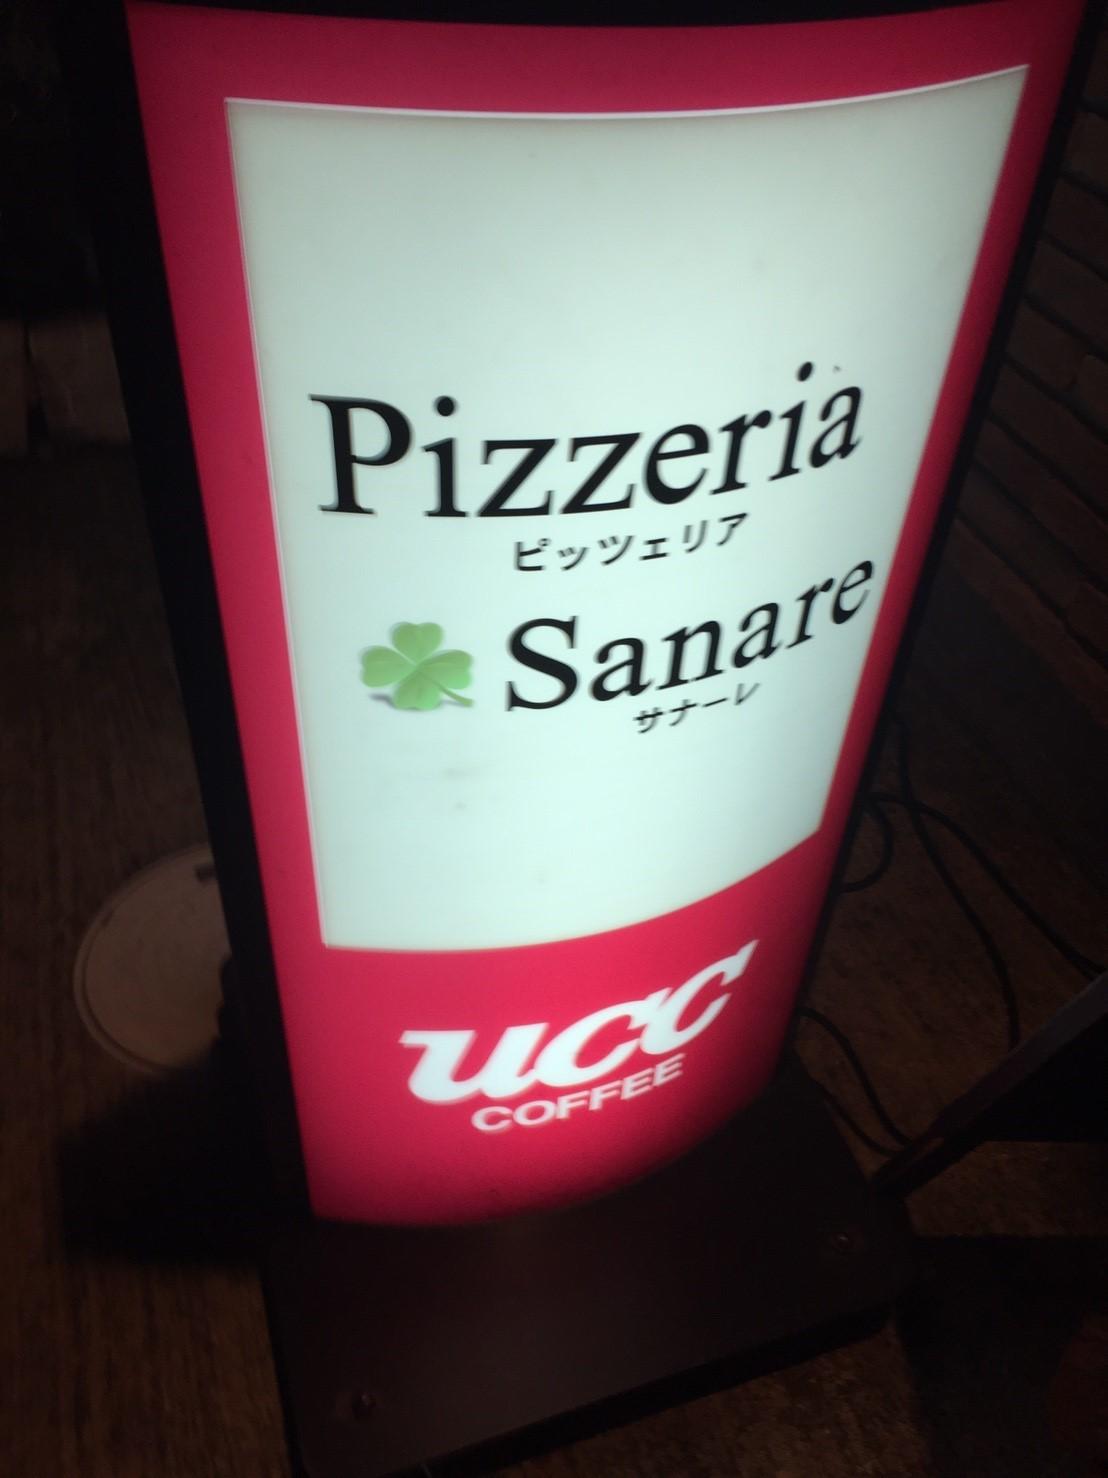 Pizzeria Sanare 取り分けディナー_e0115904_05034332.jpg